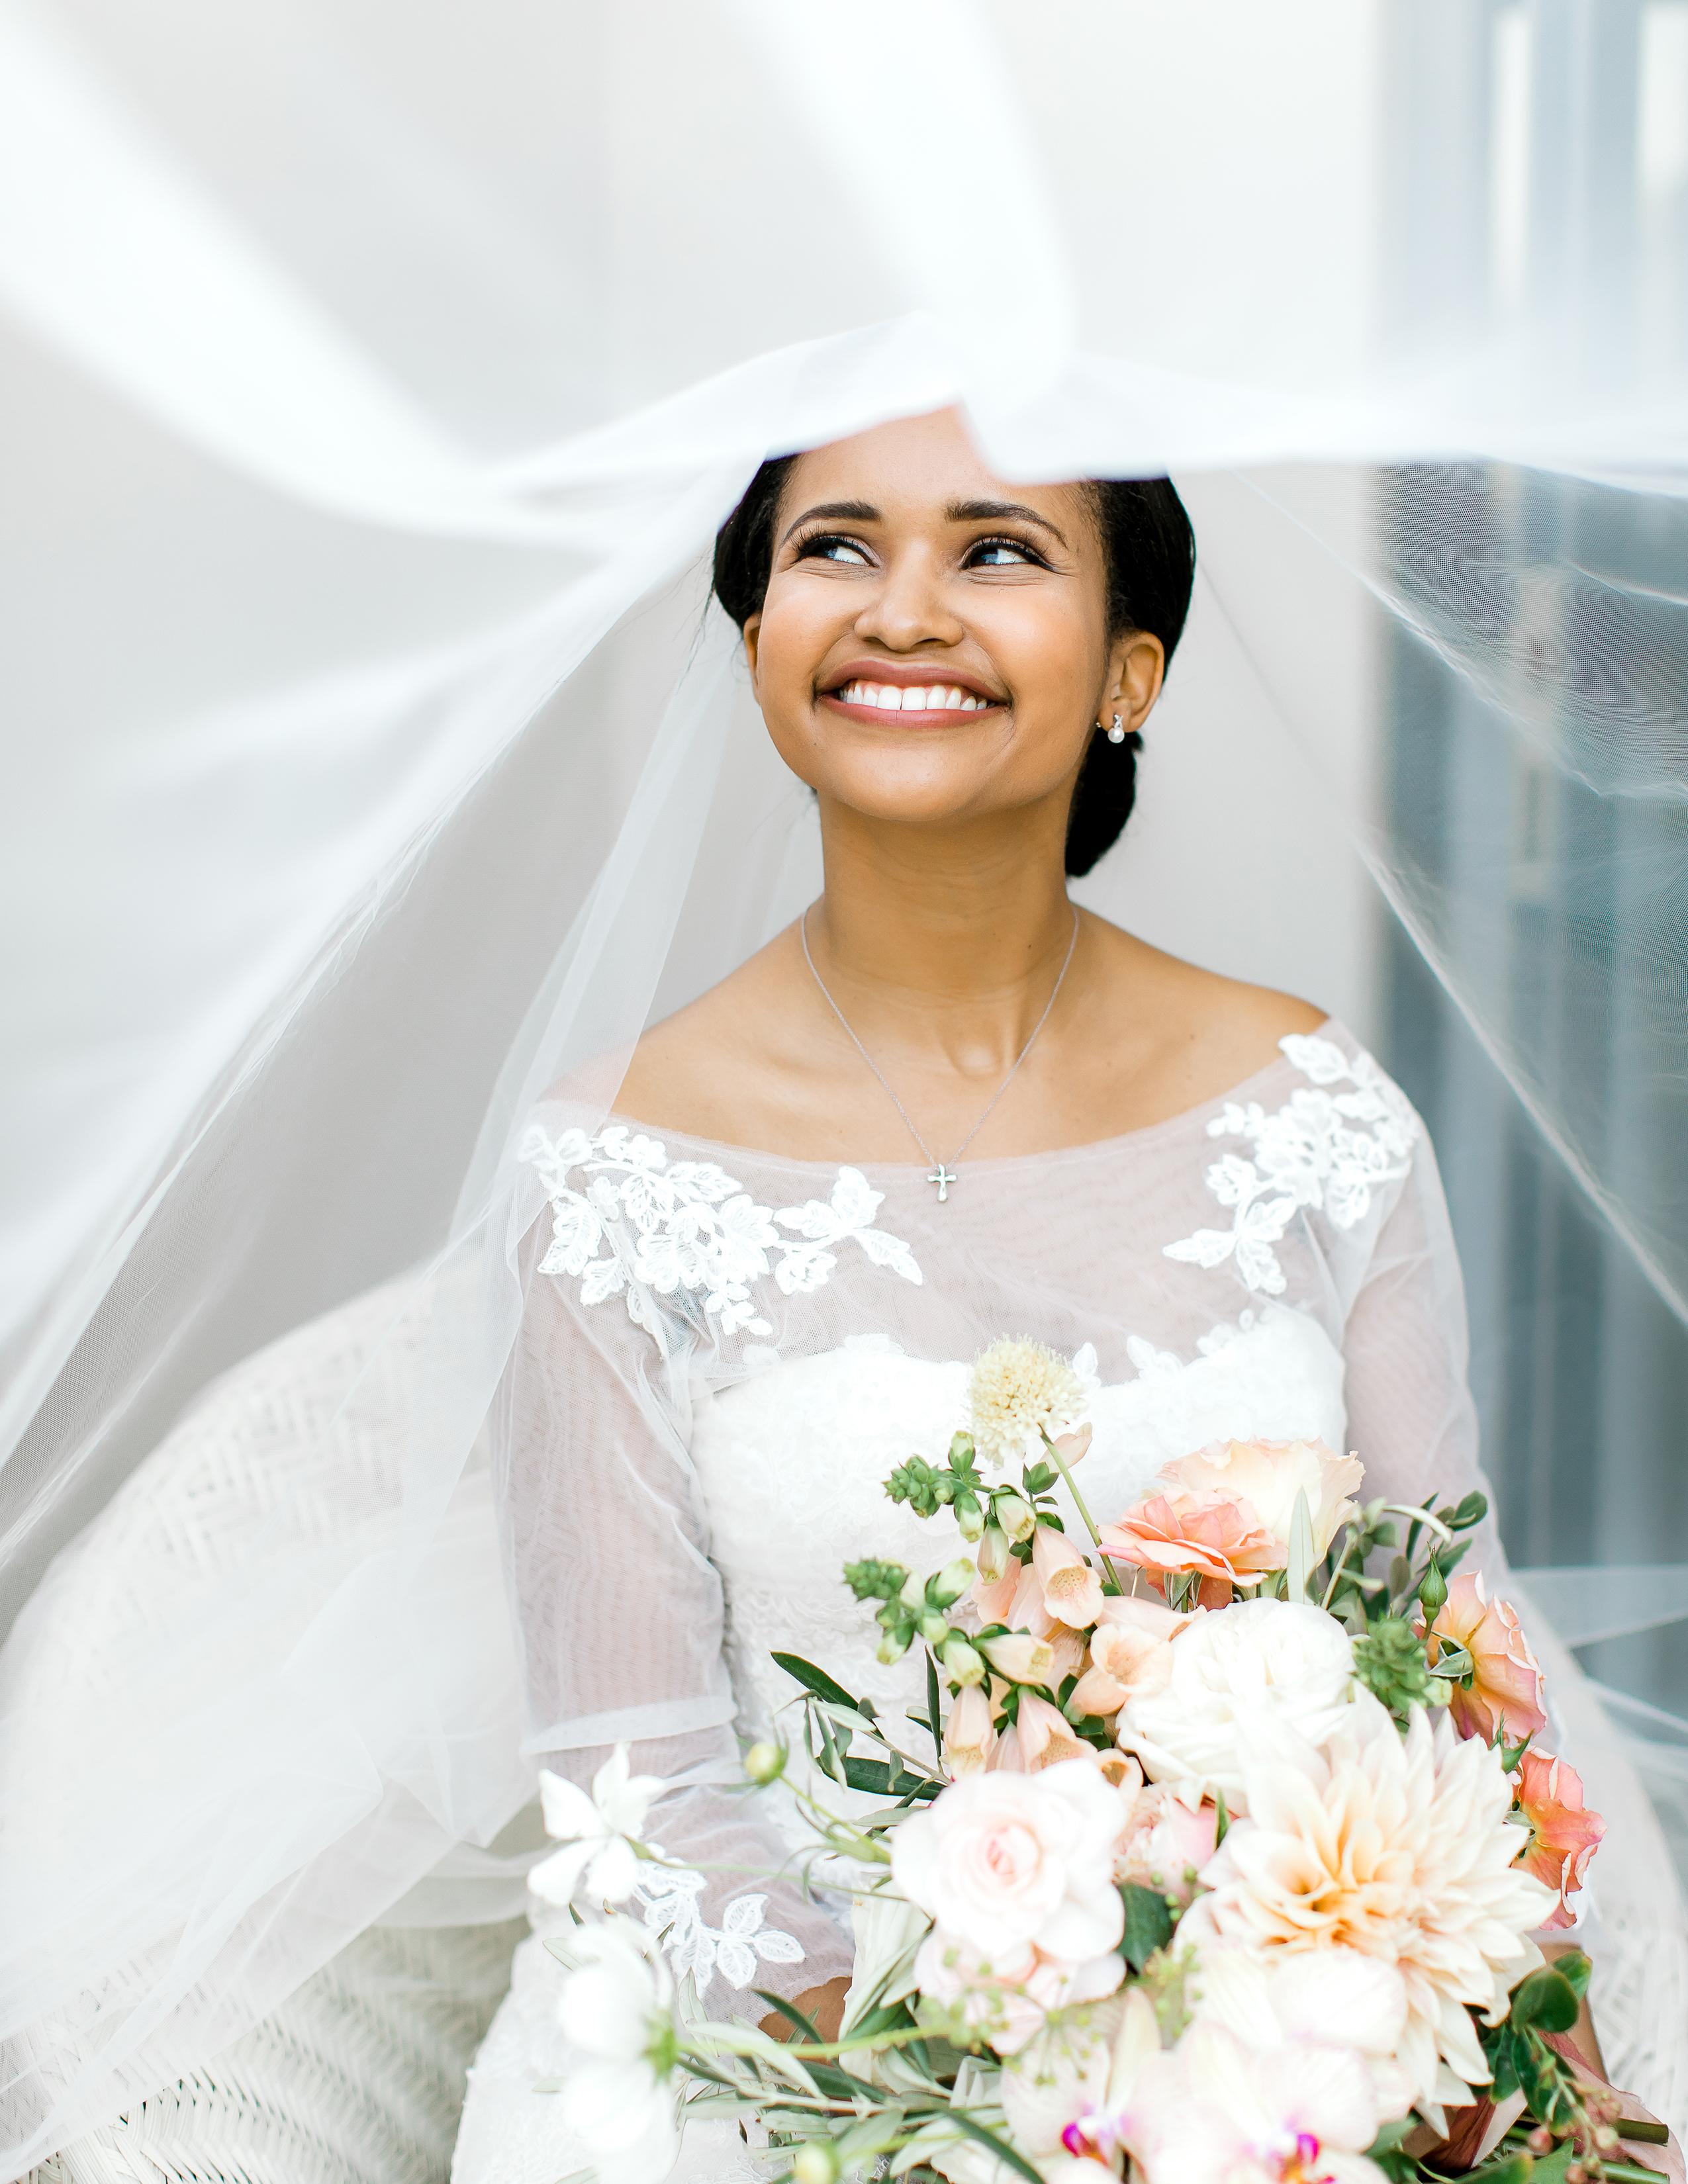 rorisang stephen bride under veil